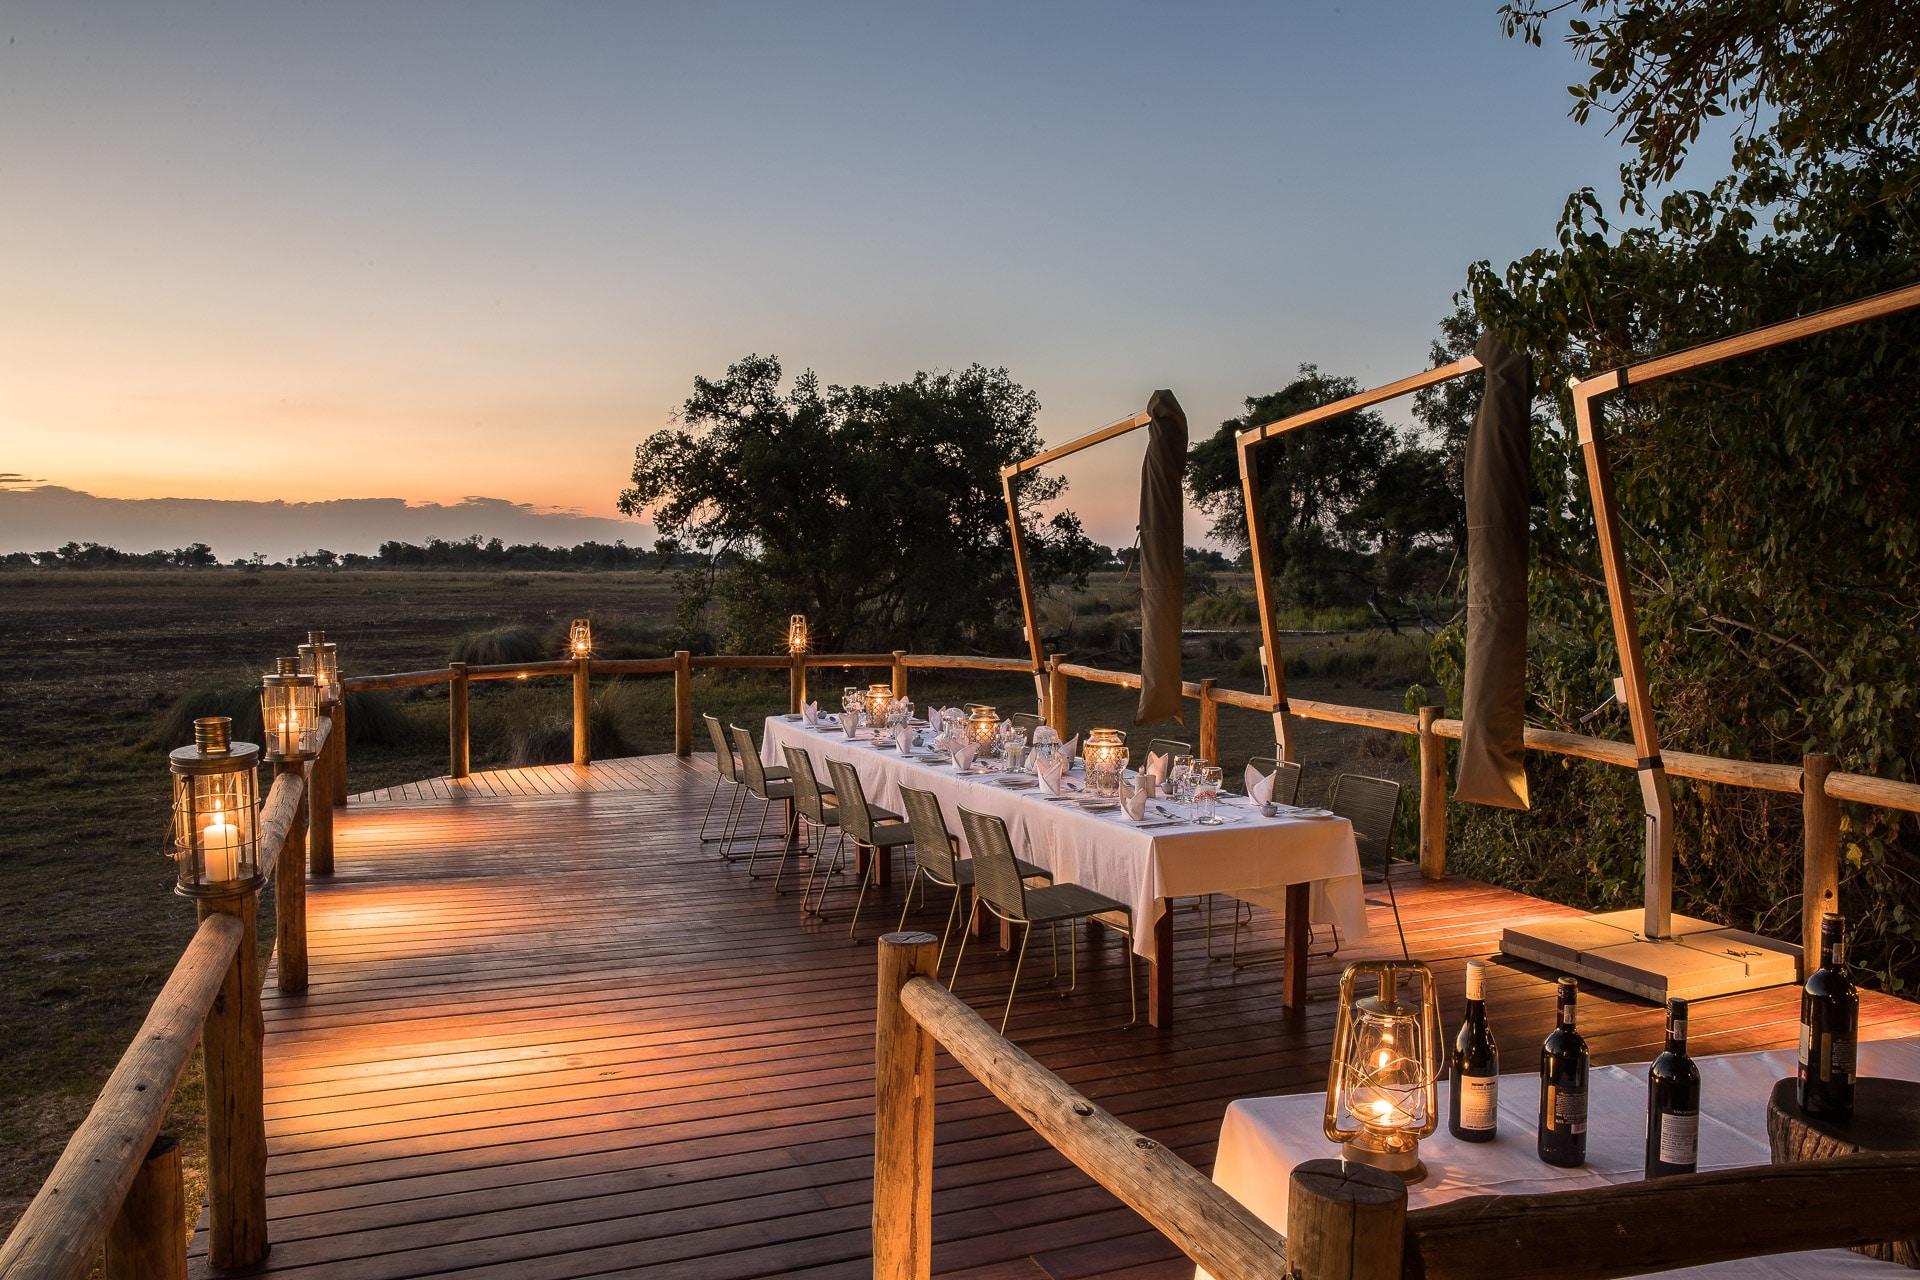 Kanana-Camp-Okavango-Delta-Botswana-20